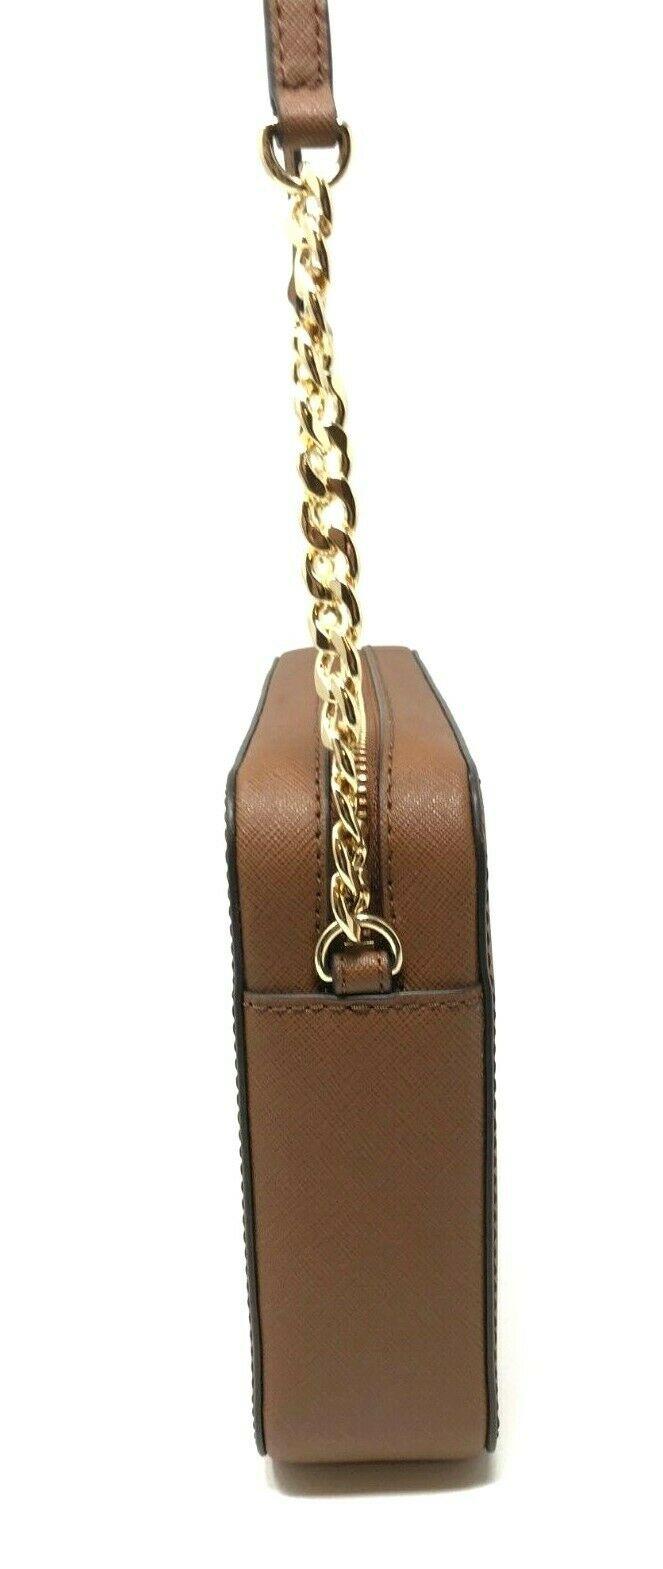 thumbnail 10 - Michael Kors Jet Set Item Large East West Crossbody Chain Handbag Clutch $298